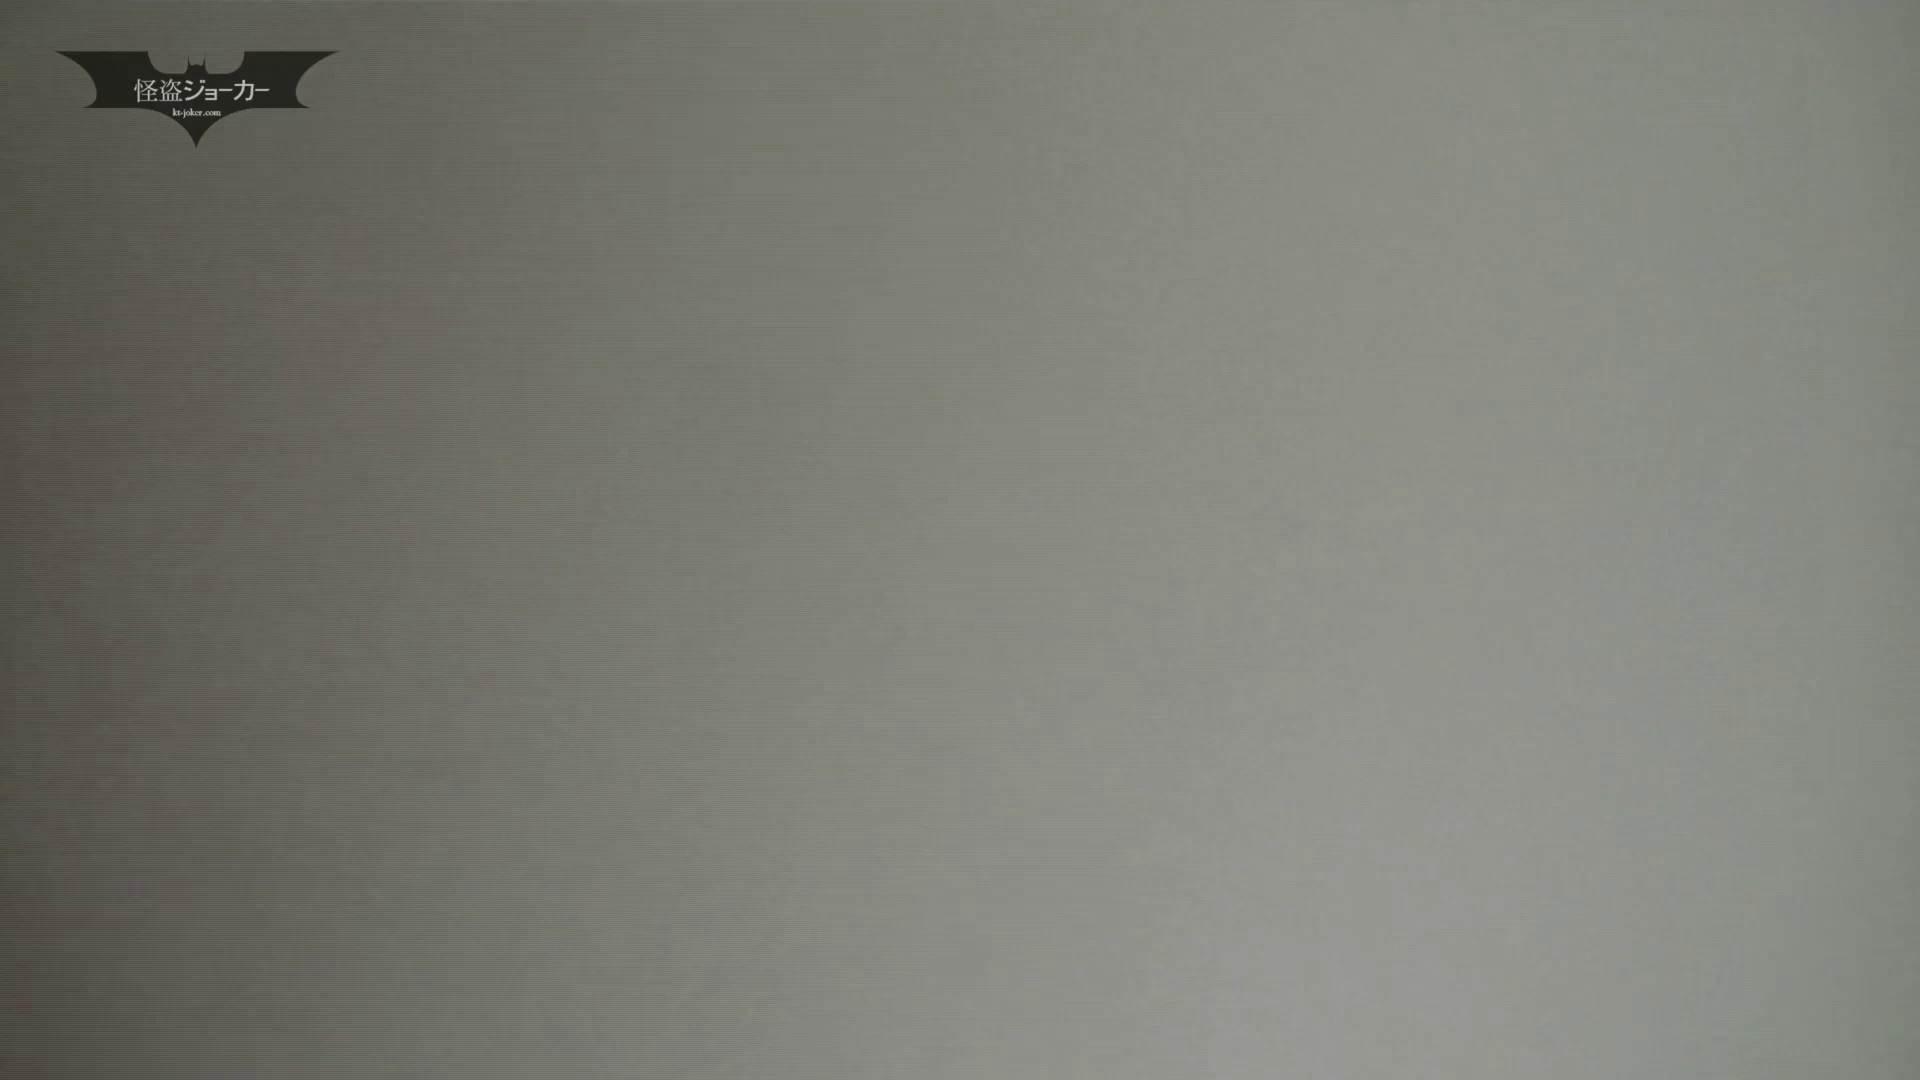 巨乳 乳首:潜入!!台湾名門女学院 Vol.11 三尻同時狩り:怪盗ジョーカー